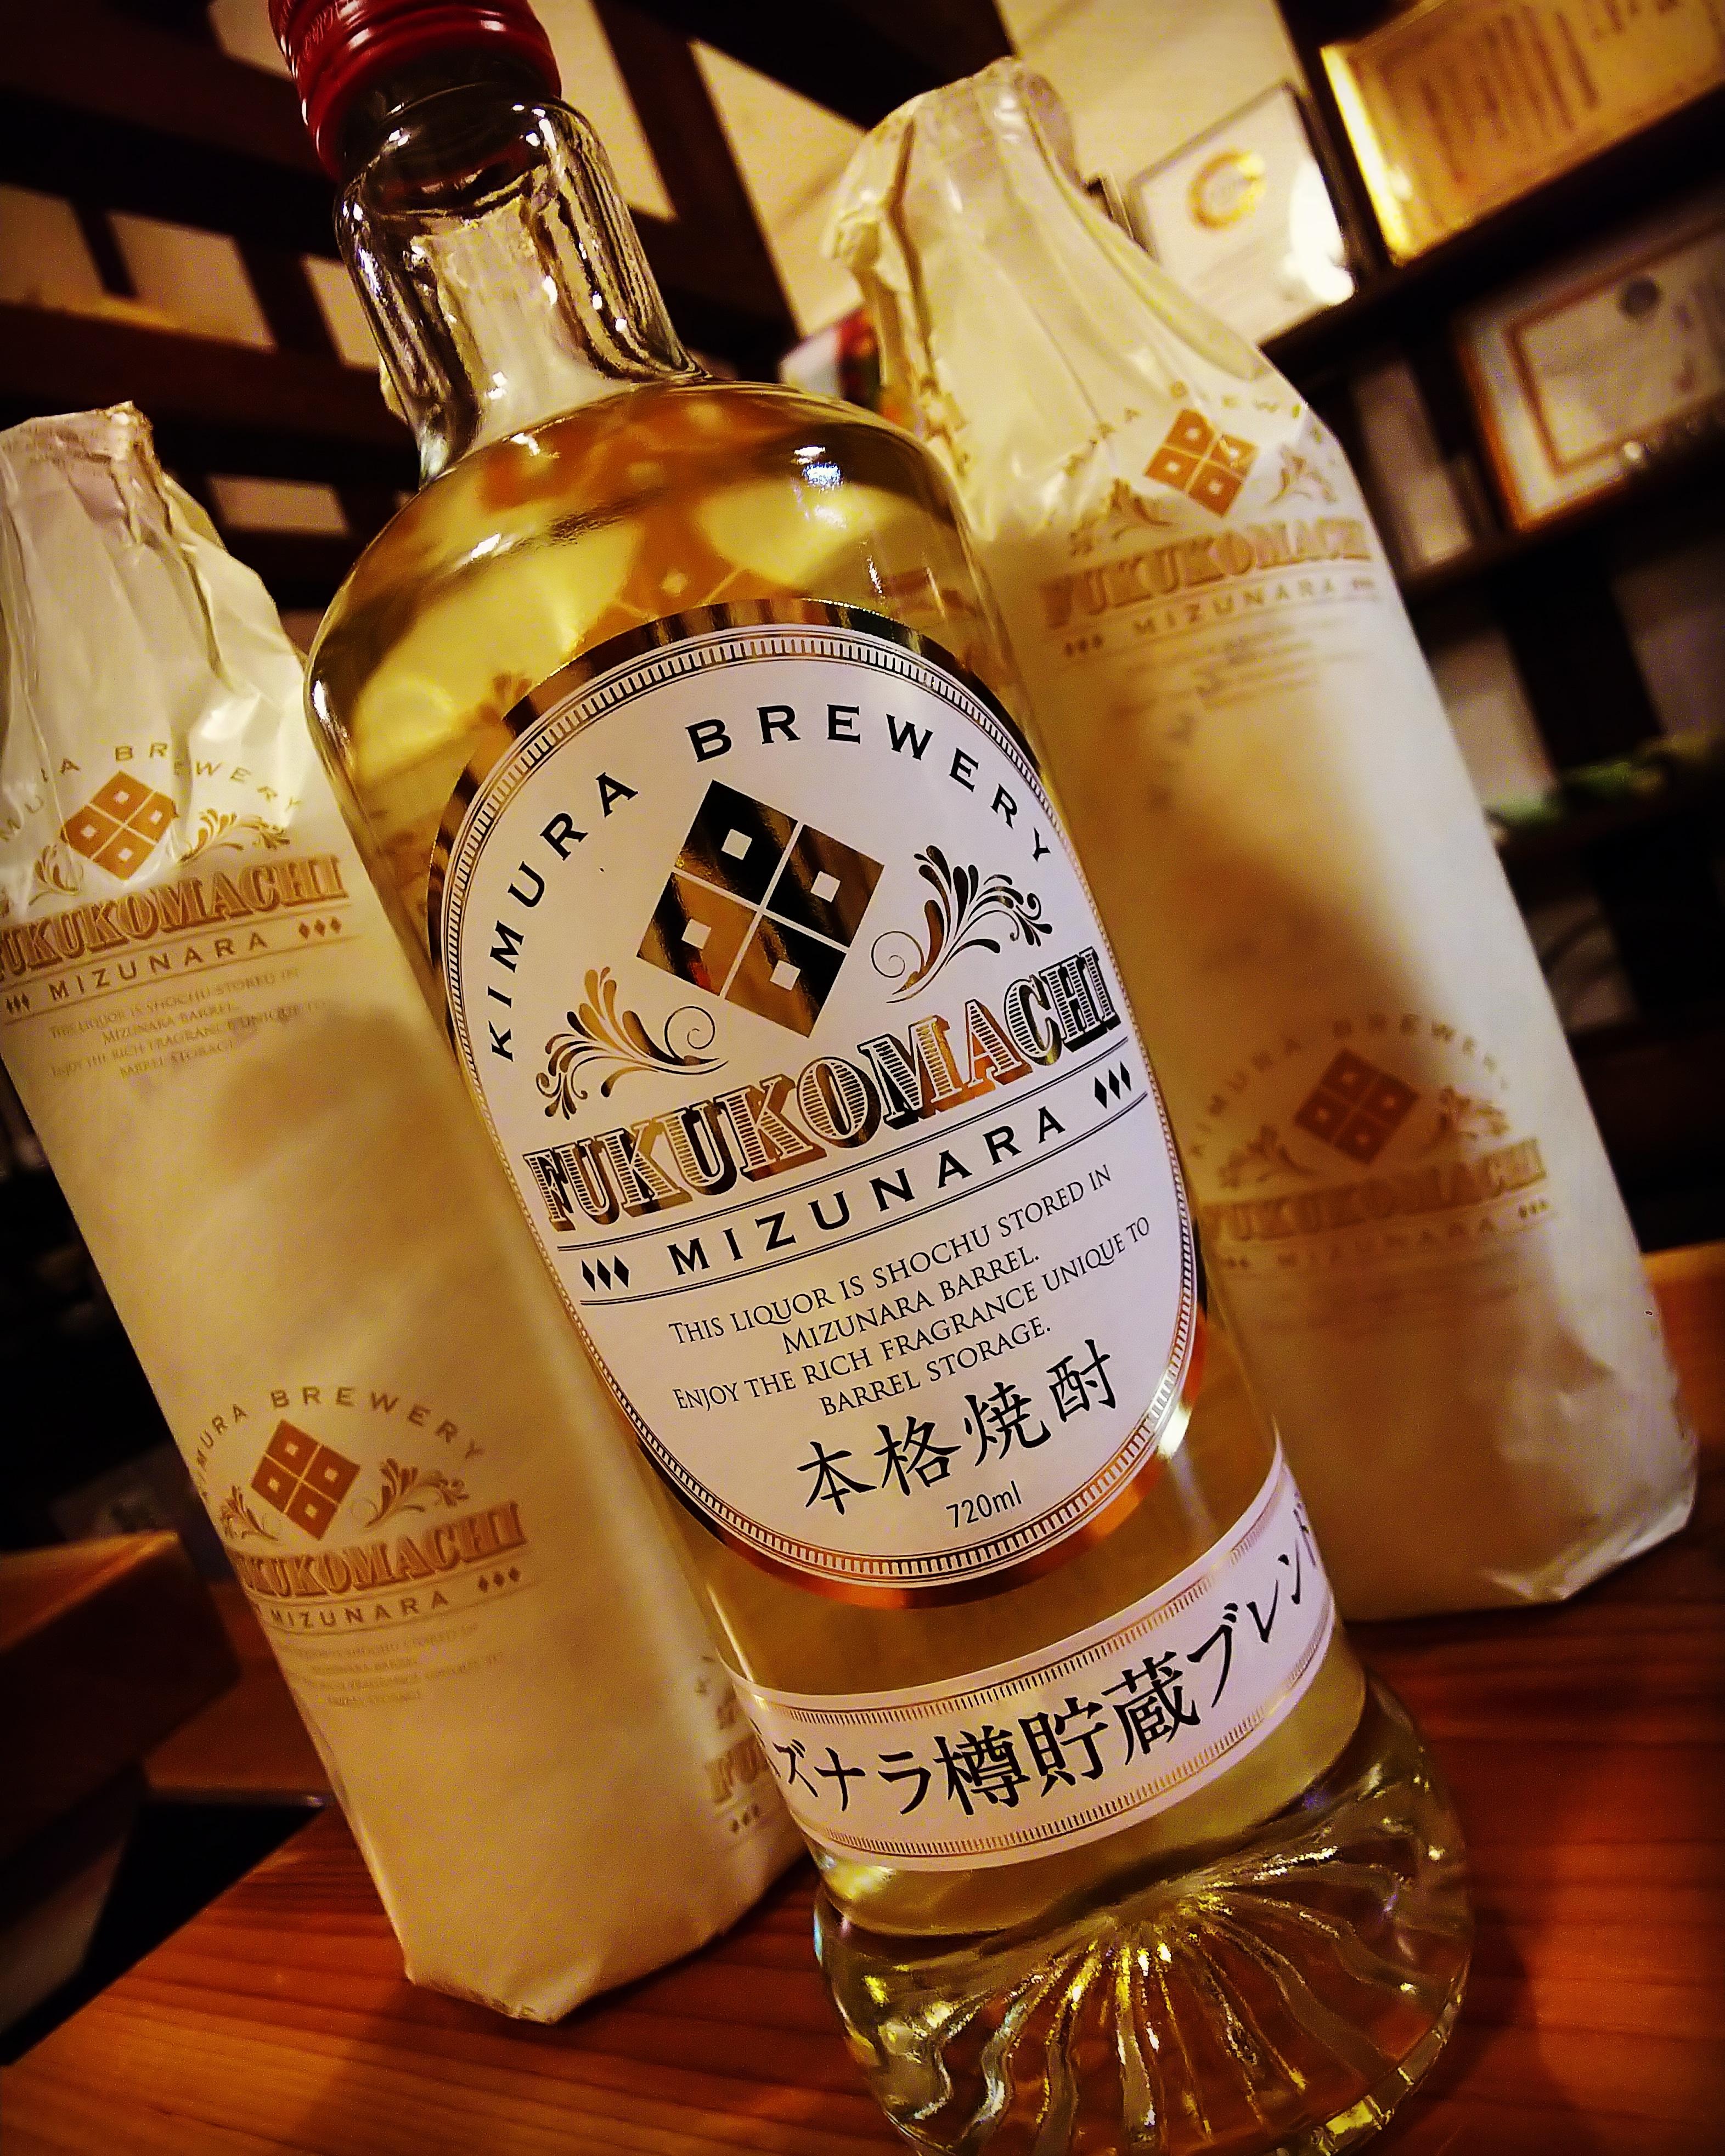 http://www.fukukomachi.com/blog/photo/IMG_20191122_193554_473.jpg